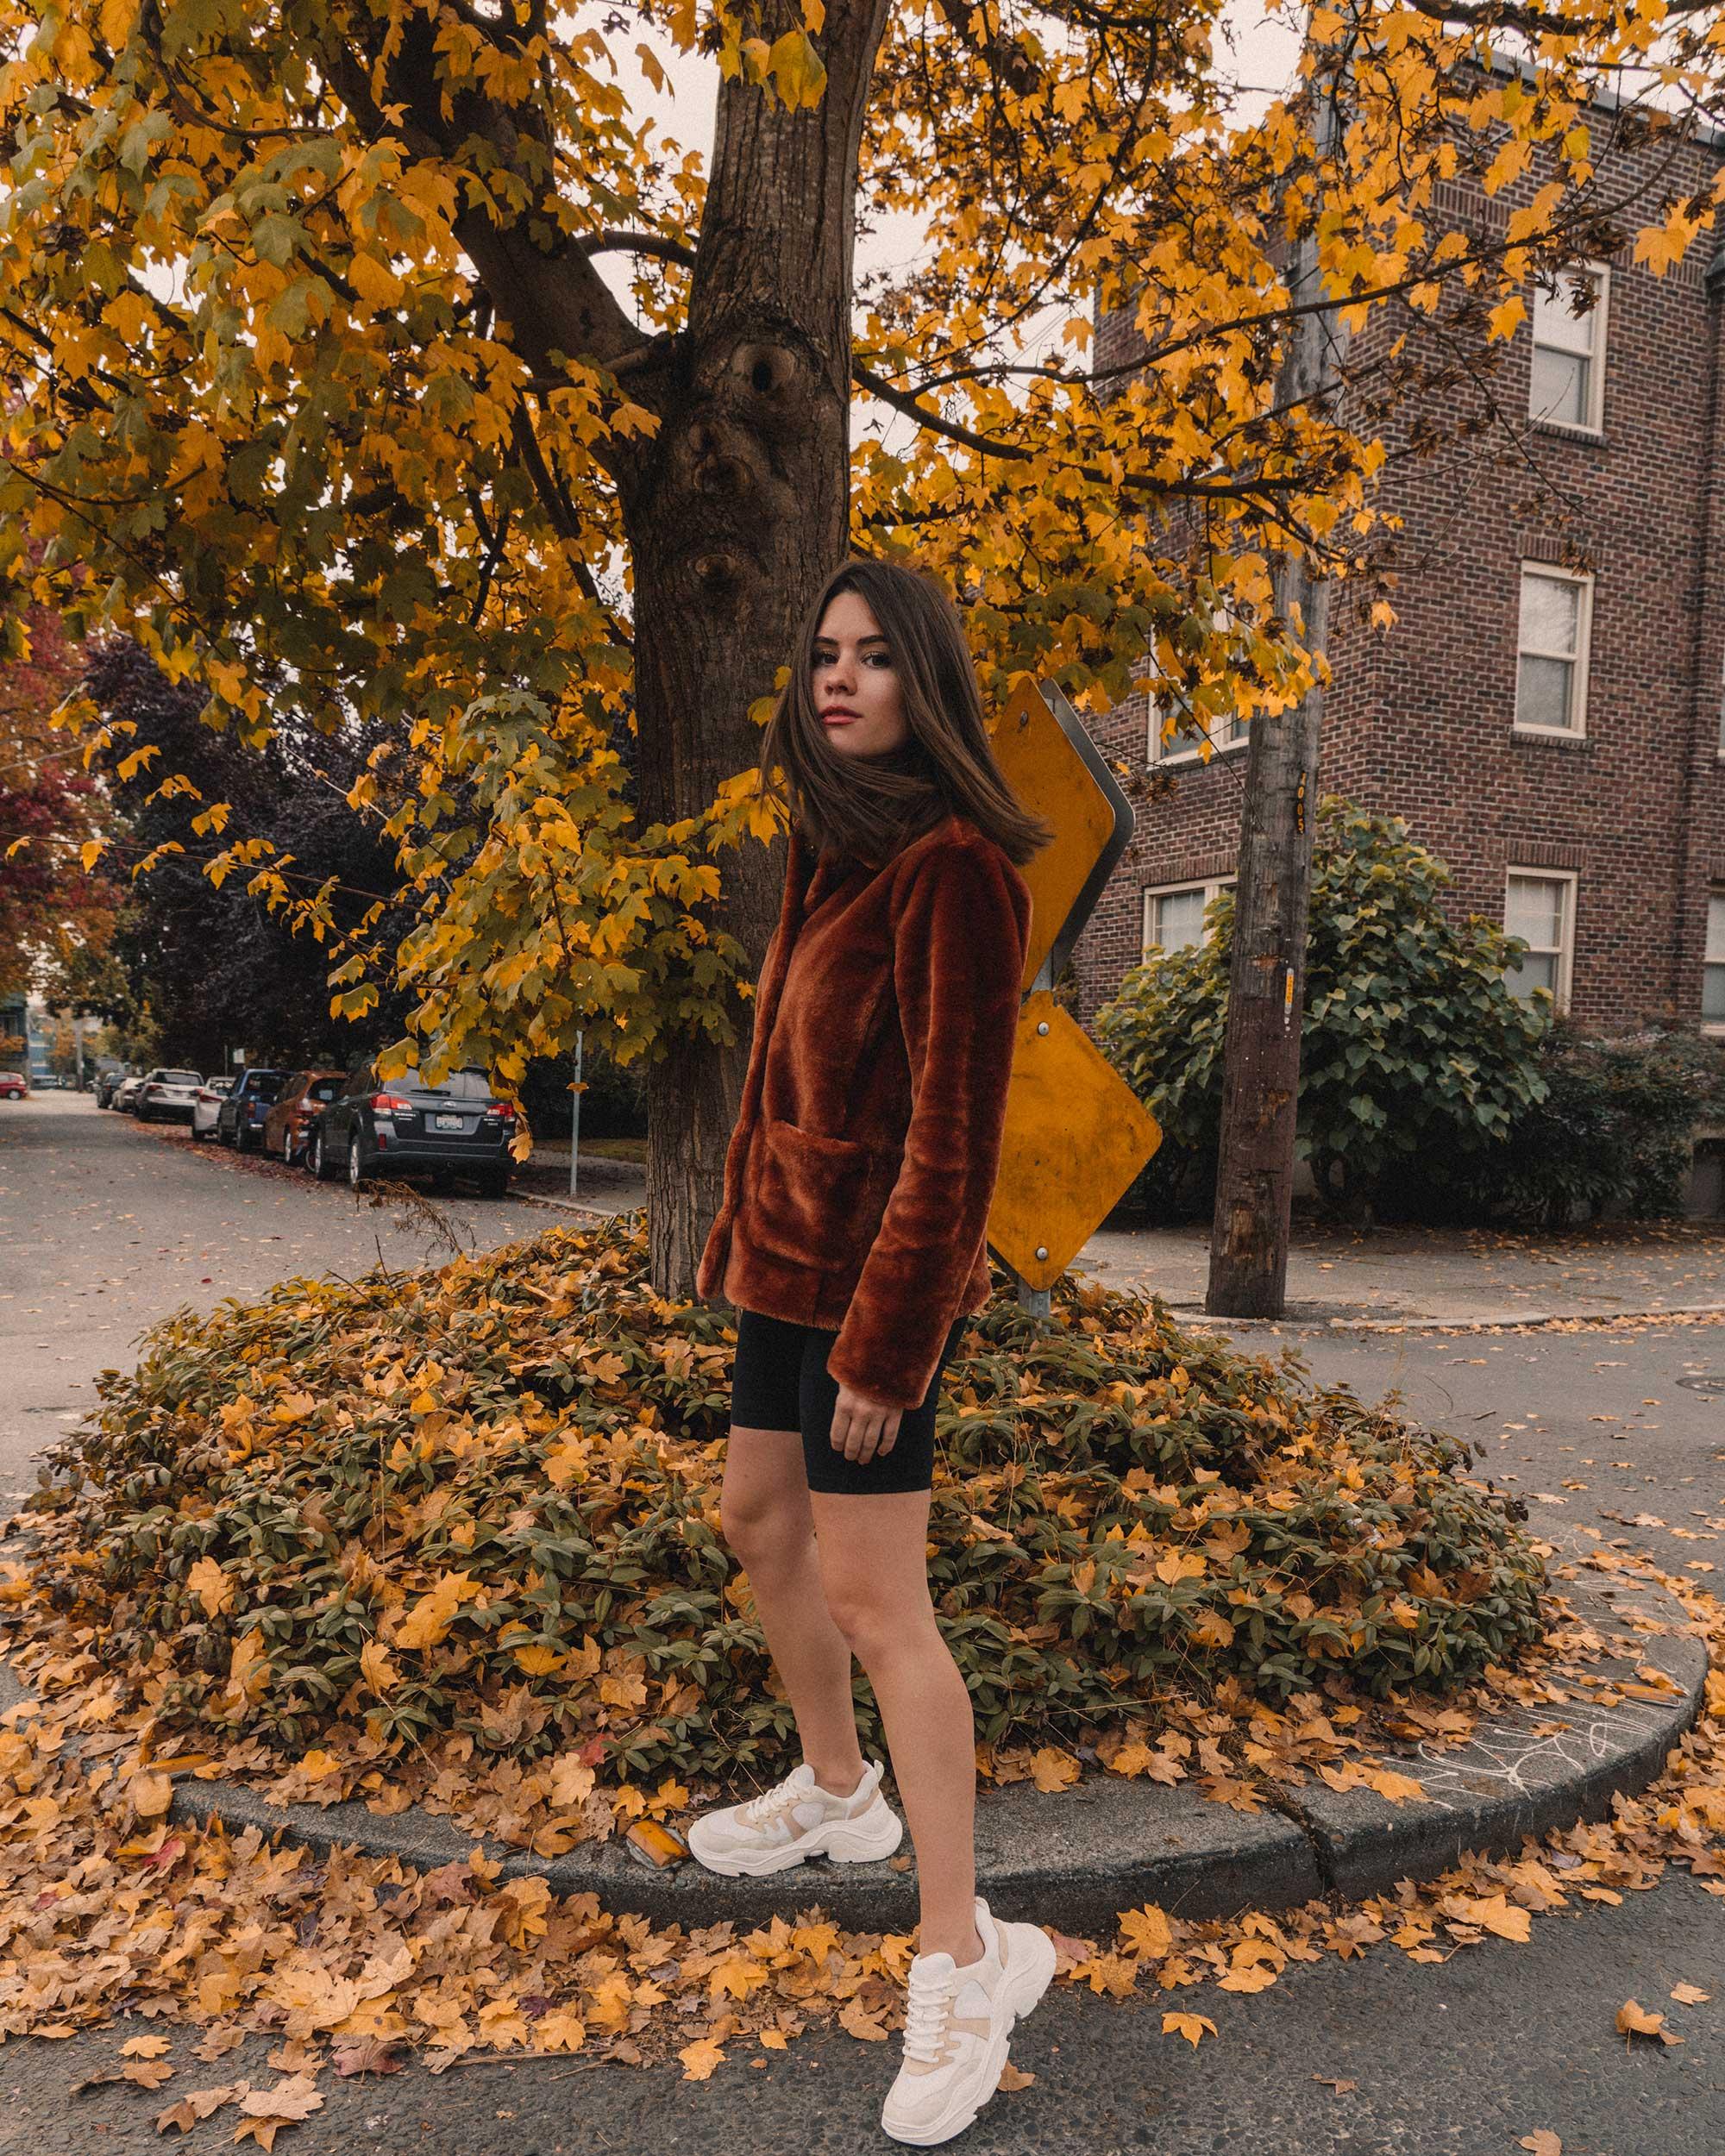 Rebecca Taylor FAUX FUR COAT in rust, fall outfit, Schutz Shoes Jackye Chunky Sneaker2.jpg